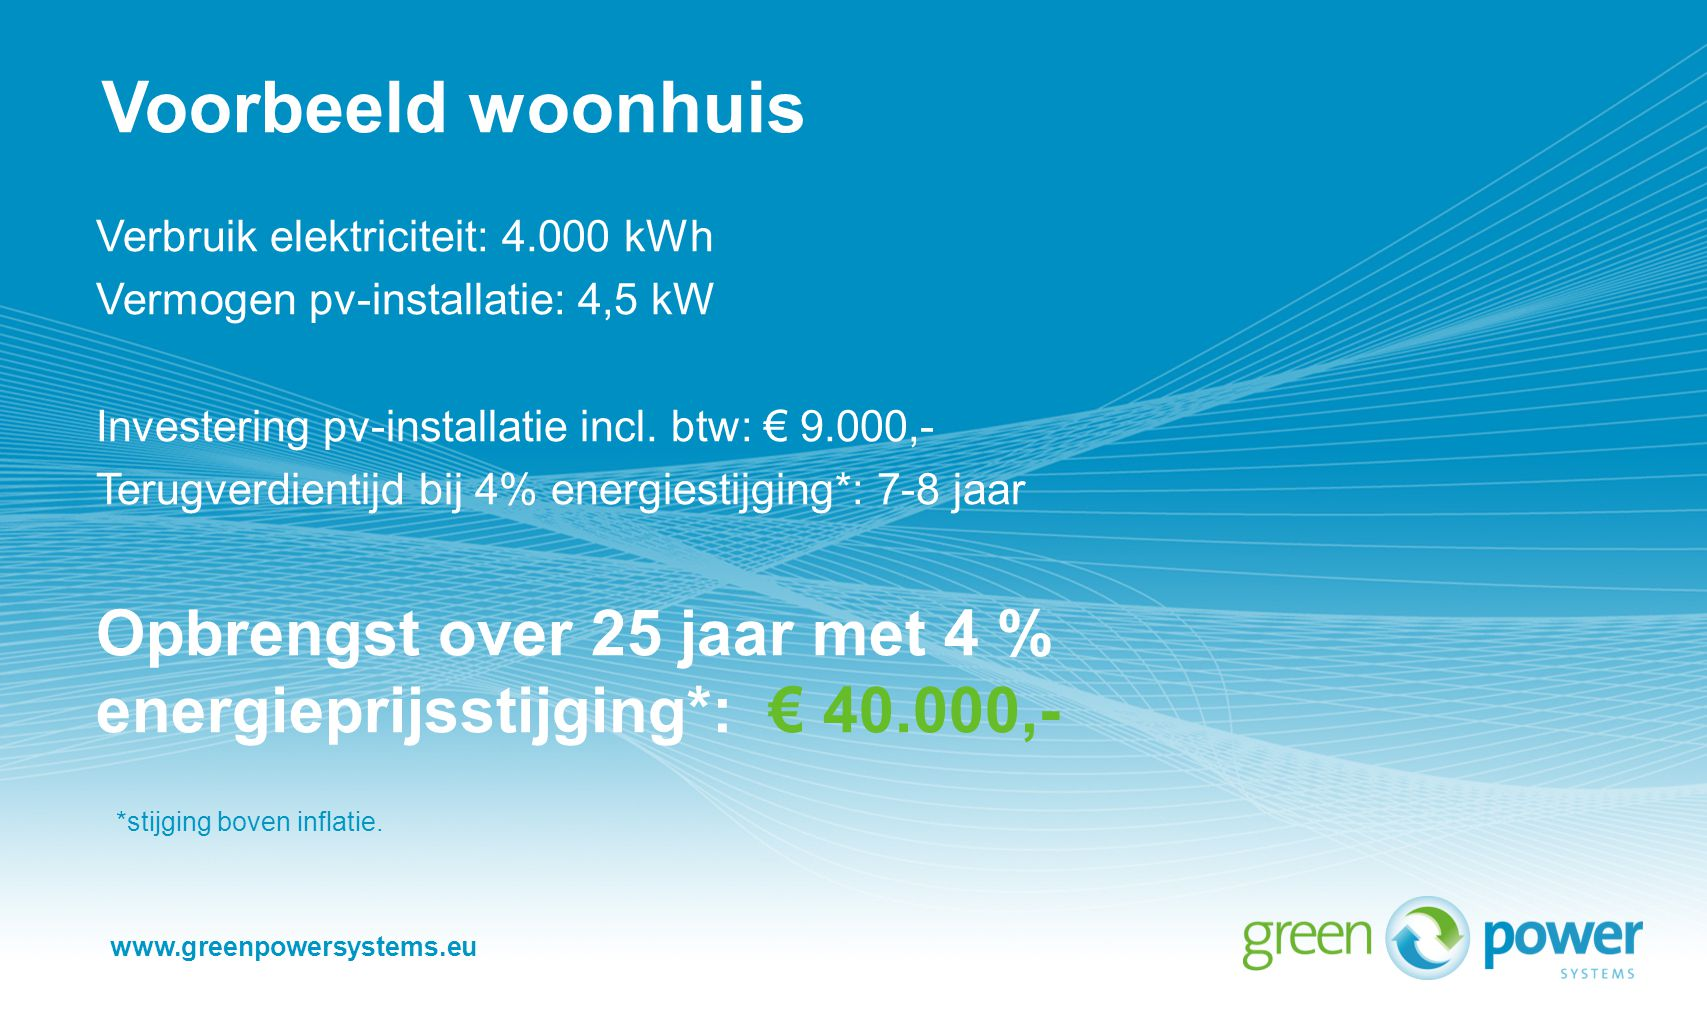 www.greenpowersystems.eu Verbruik elektriciteit: 4.000 kWh Vermogen pv-installatie: 4,5 kW Investering pv-installatie incl.